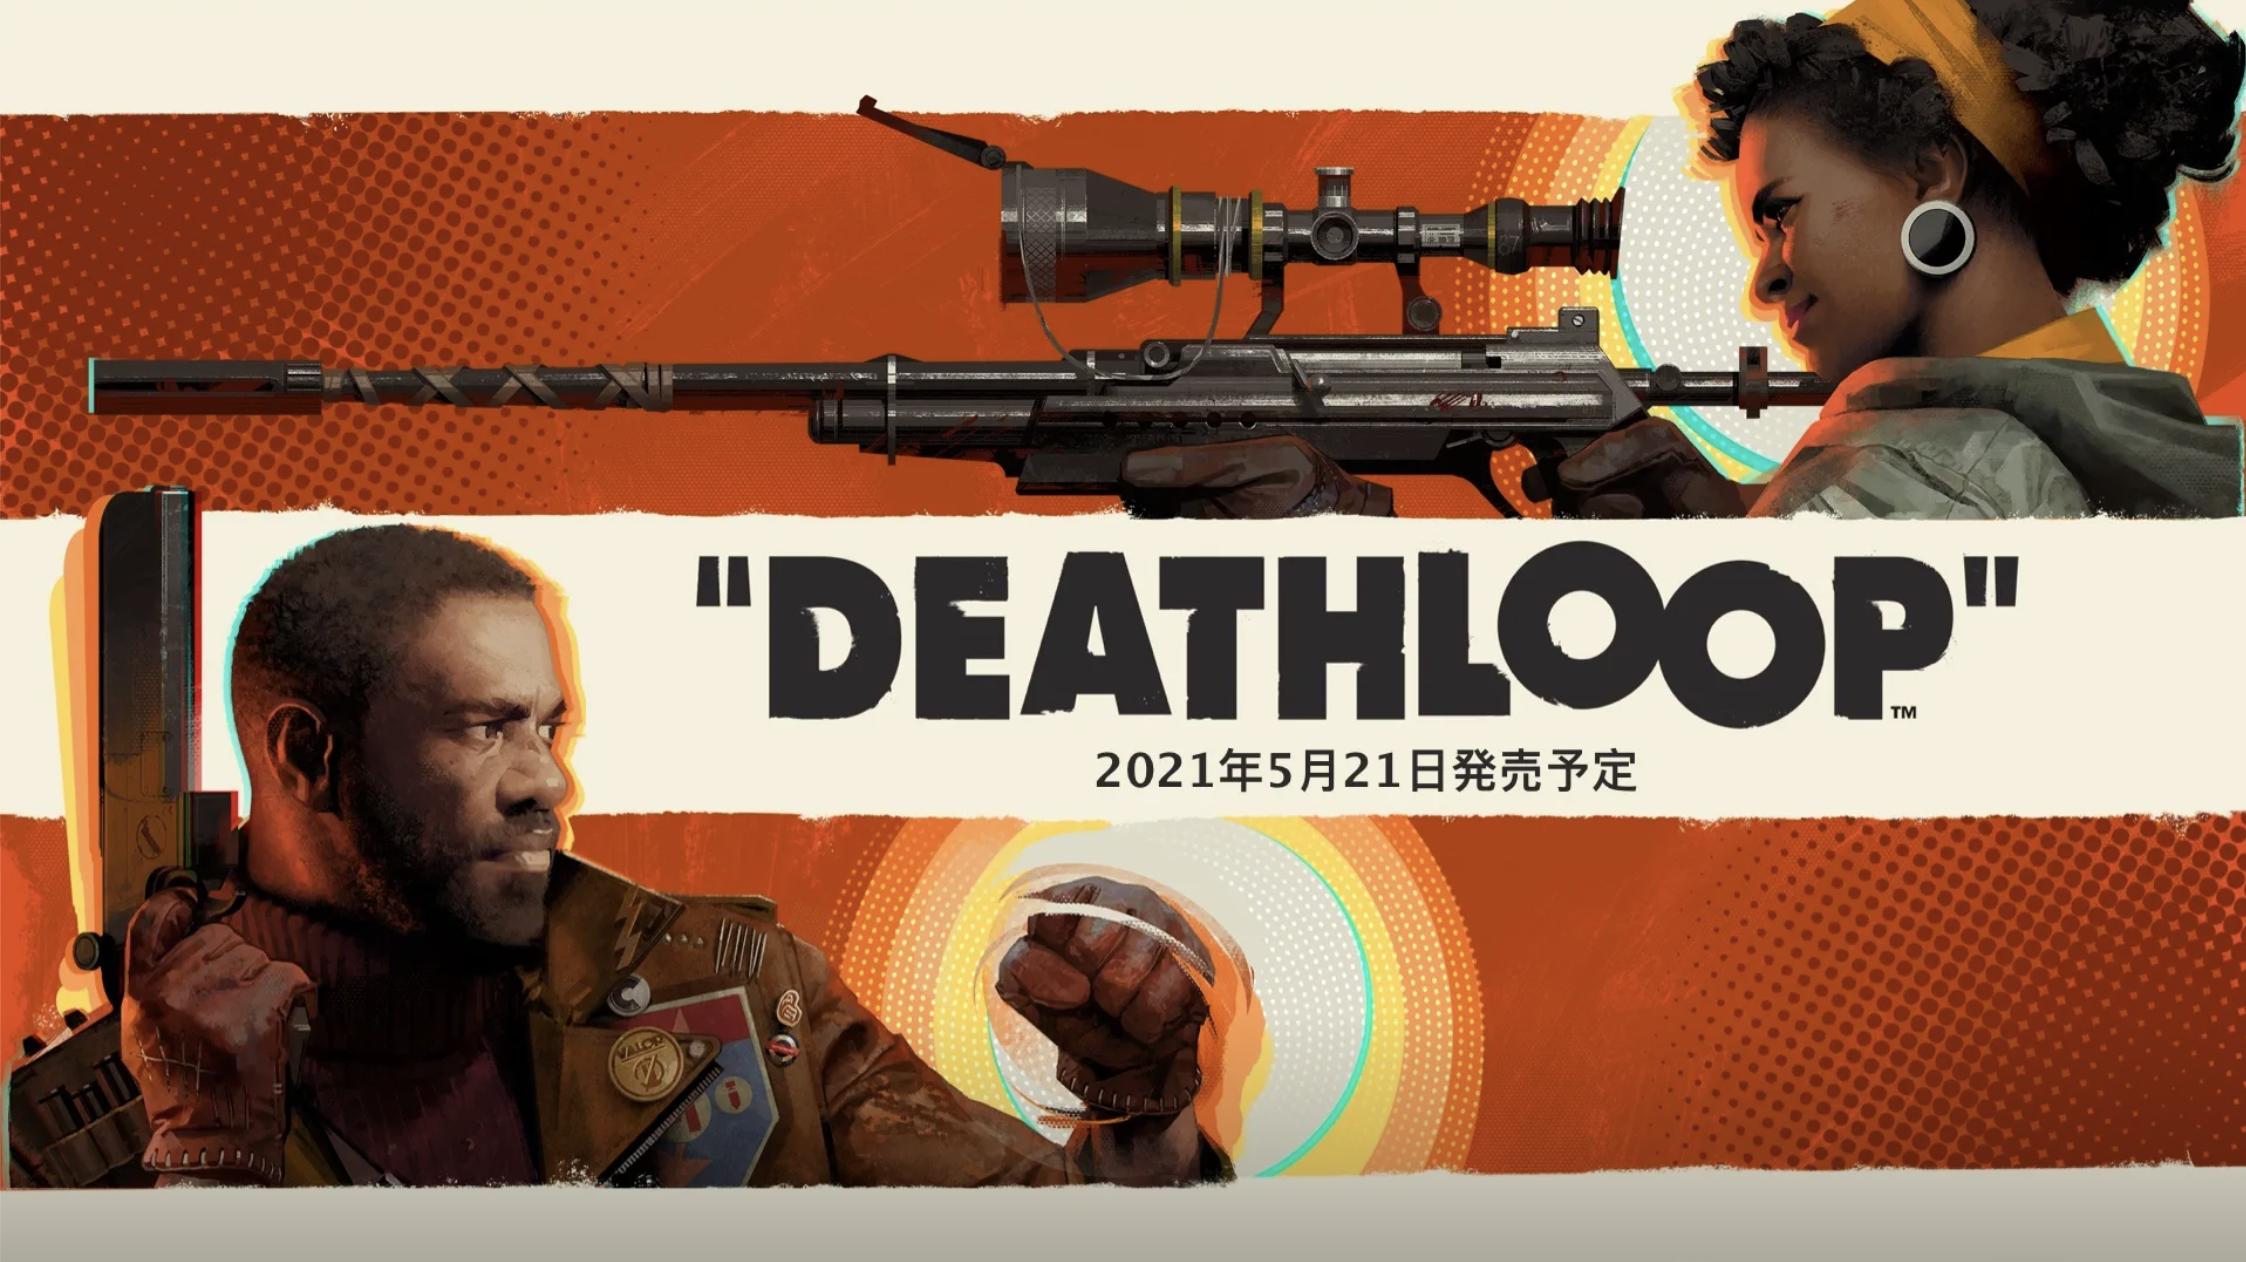 「DEATHLOOP(デスループ)」の発売日はいつ?予約特典と最新ゲーム情報の紹介